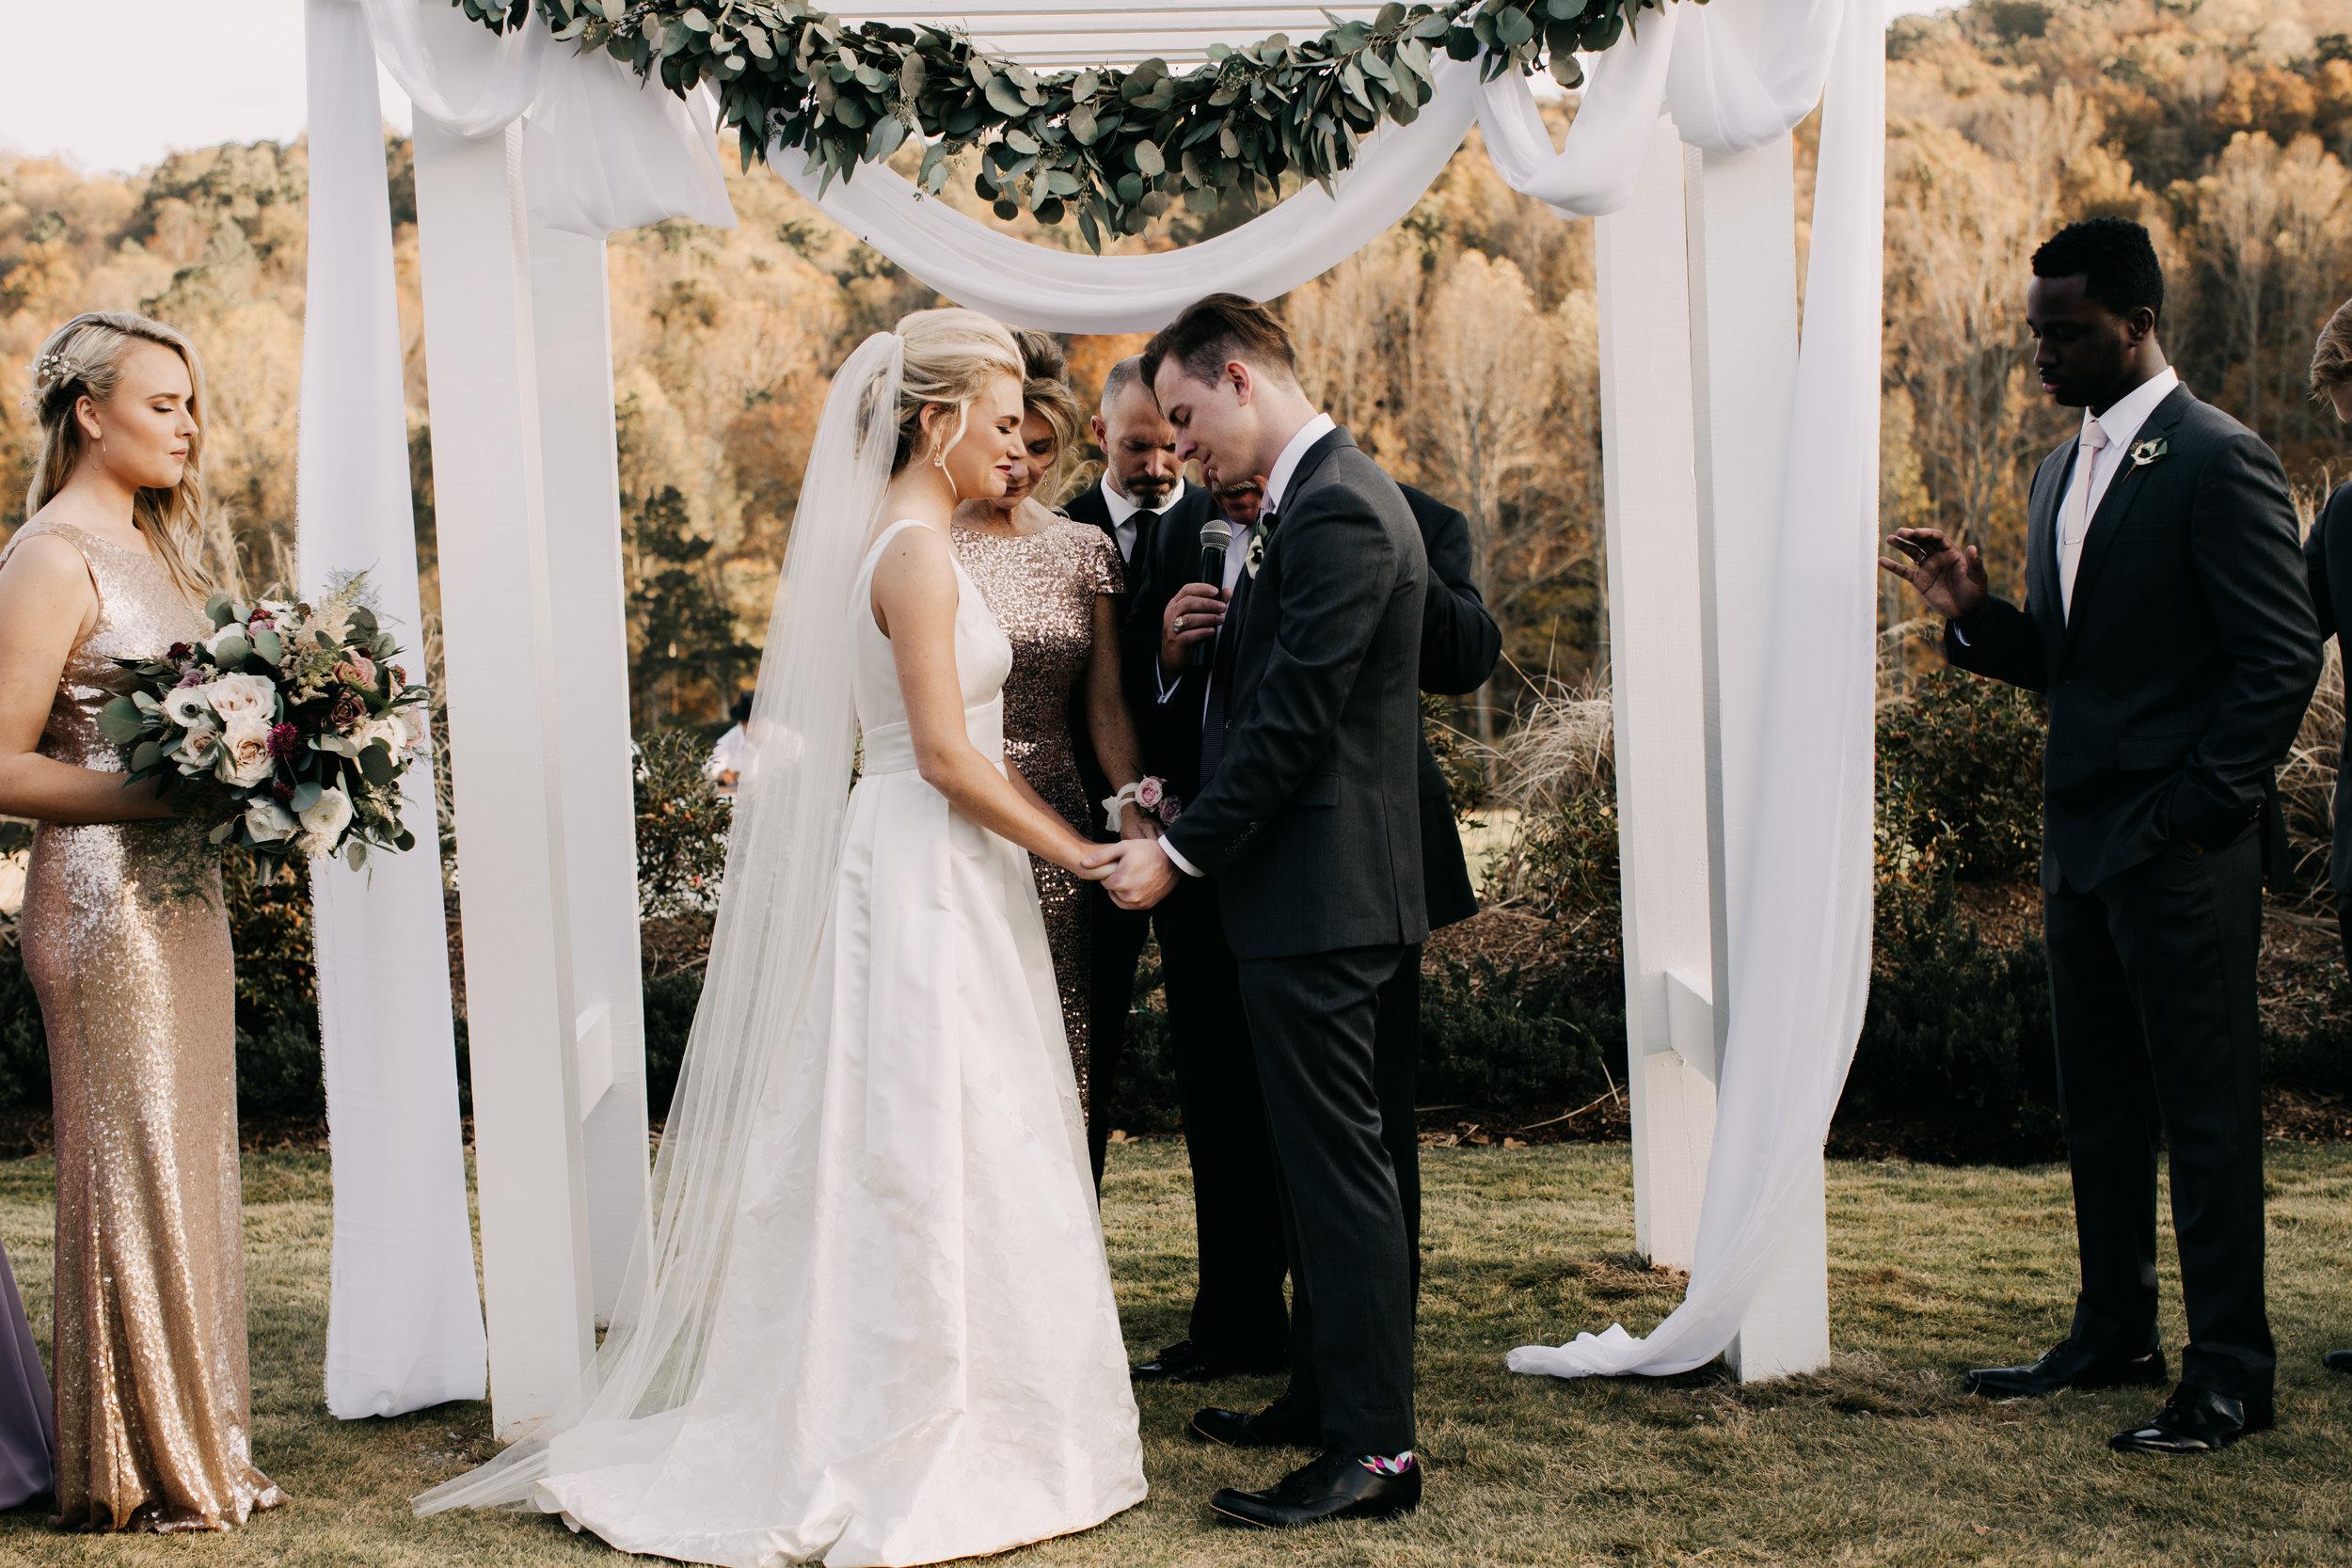 Kaylyn & Ryan Final Wedding Photos341.jpg